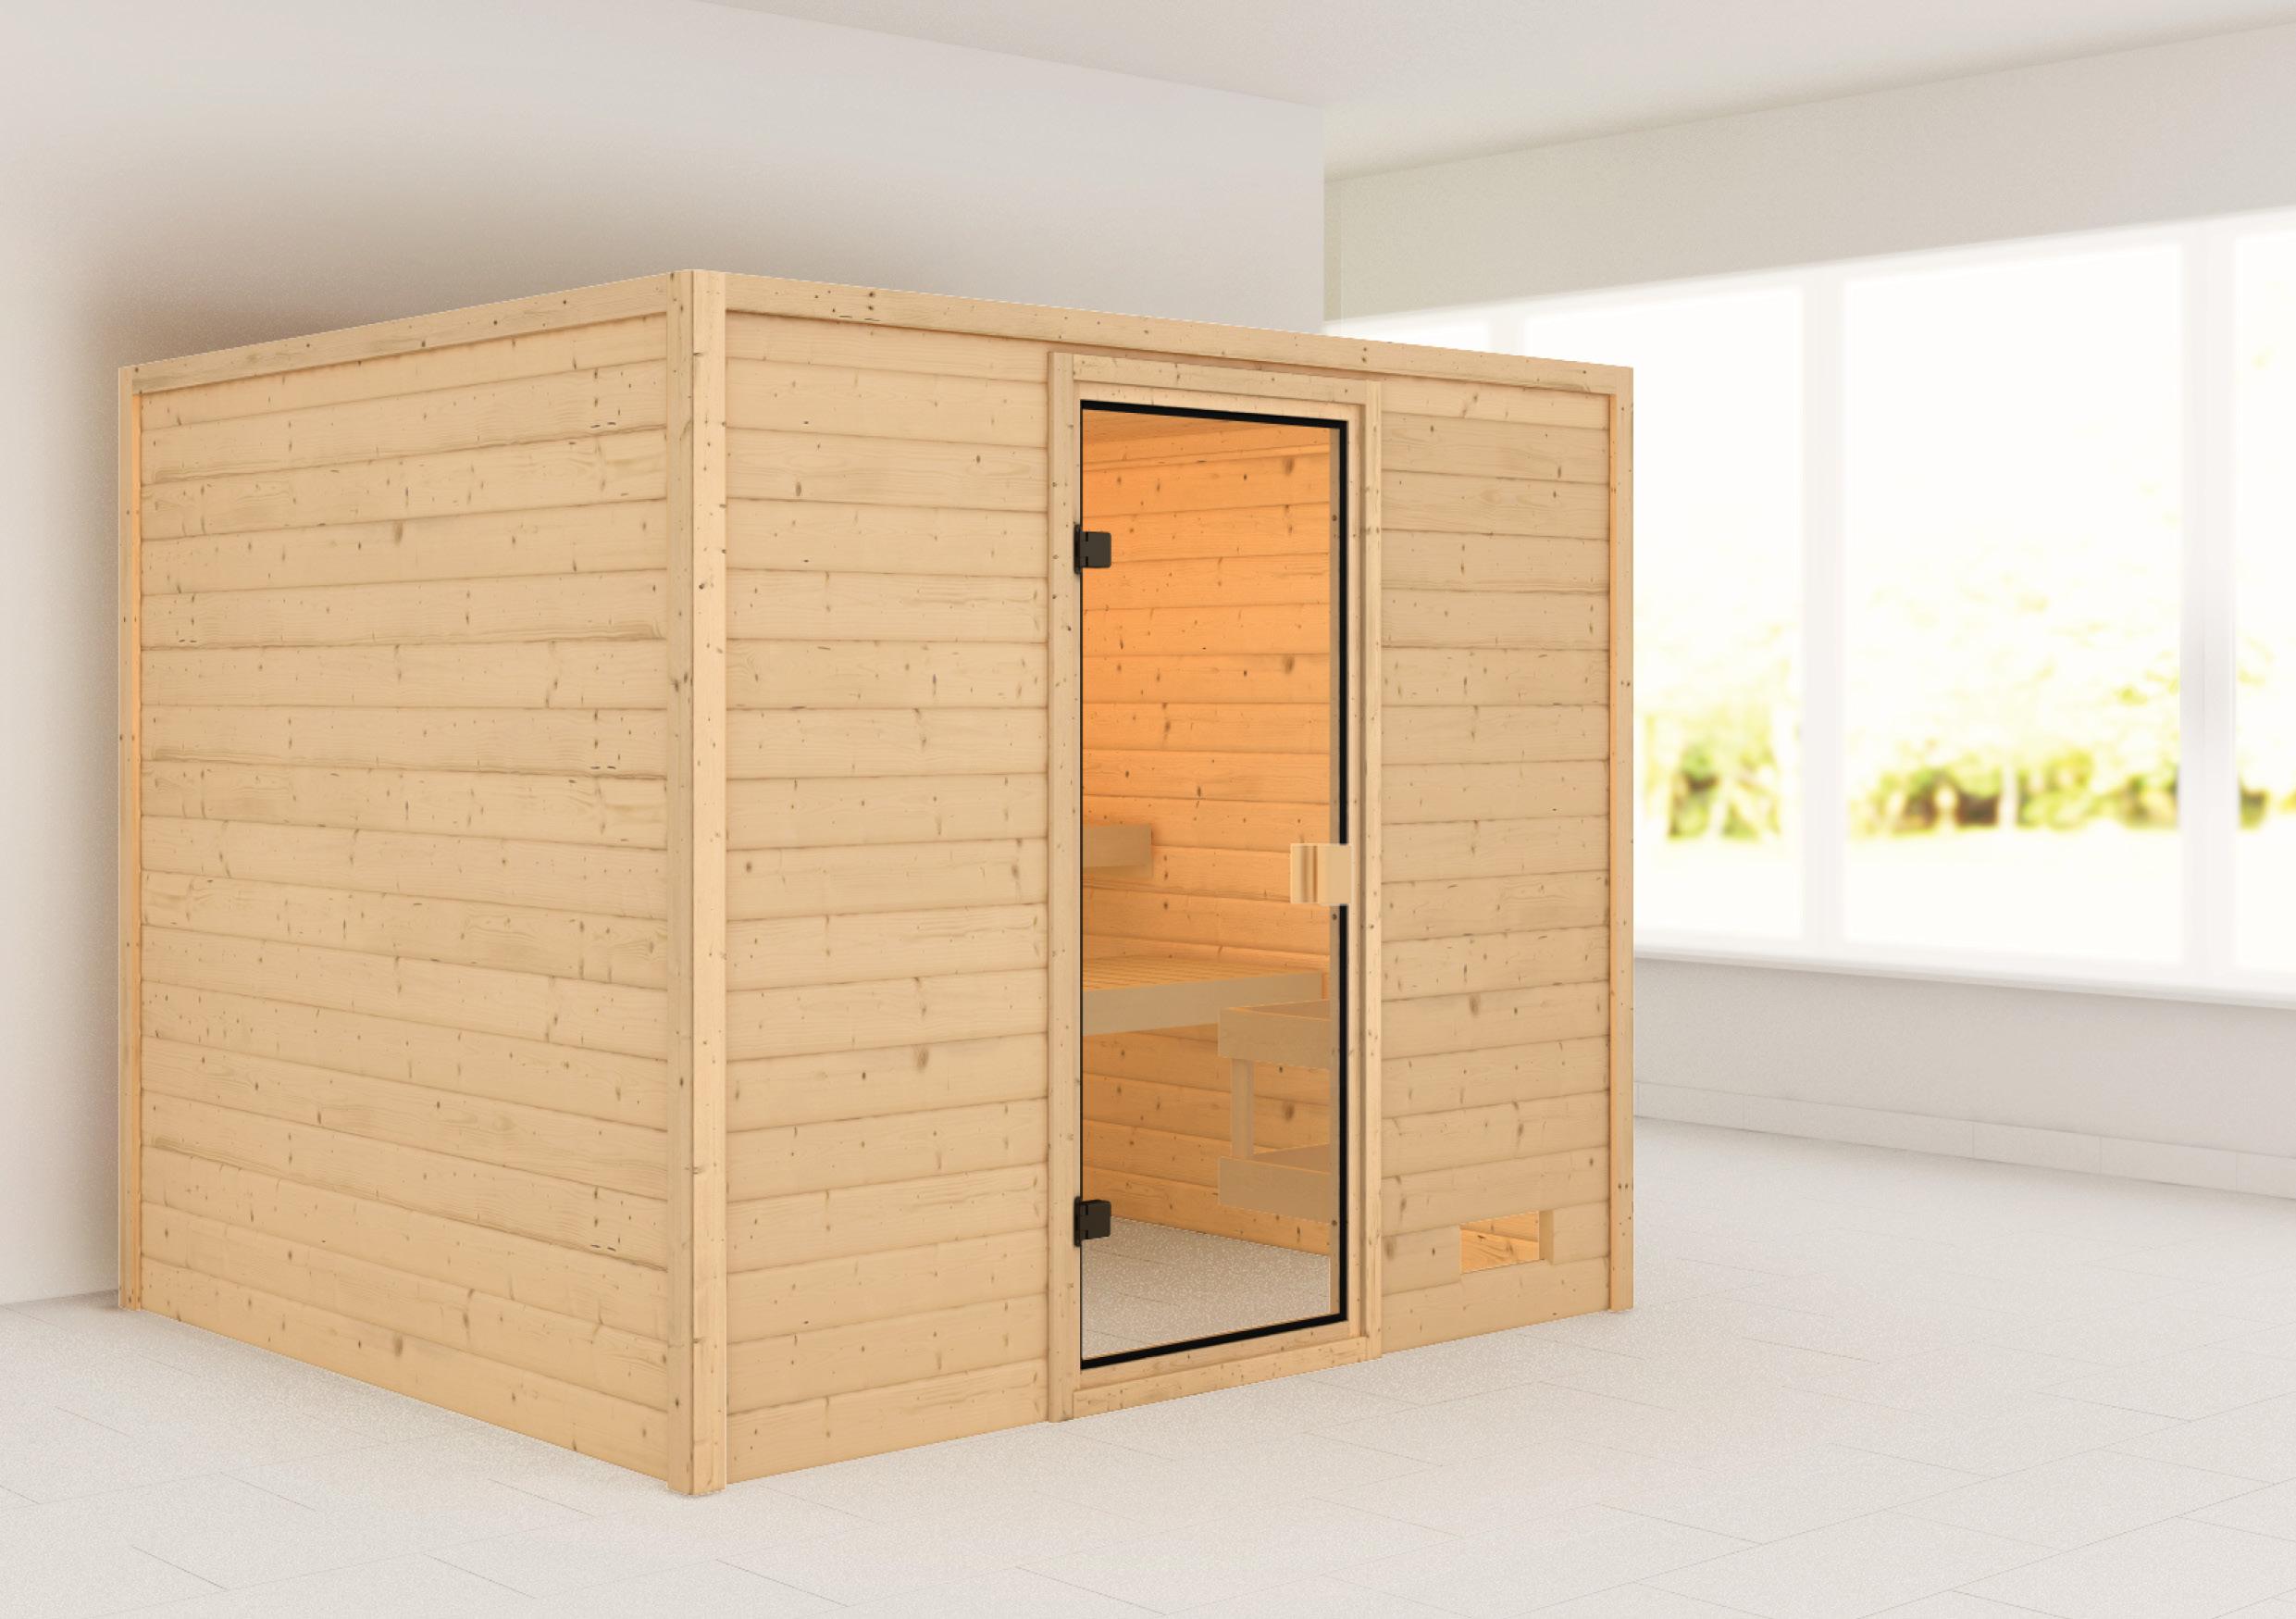 Woodfeeling Sauna Katja 38mm ohne Saunaofen Bild 1